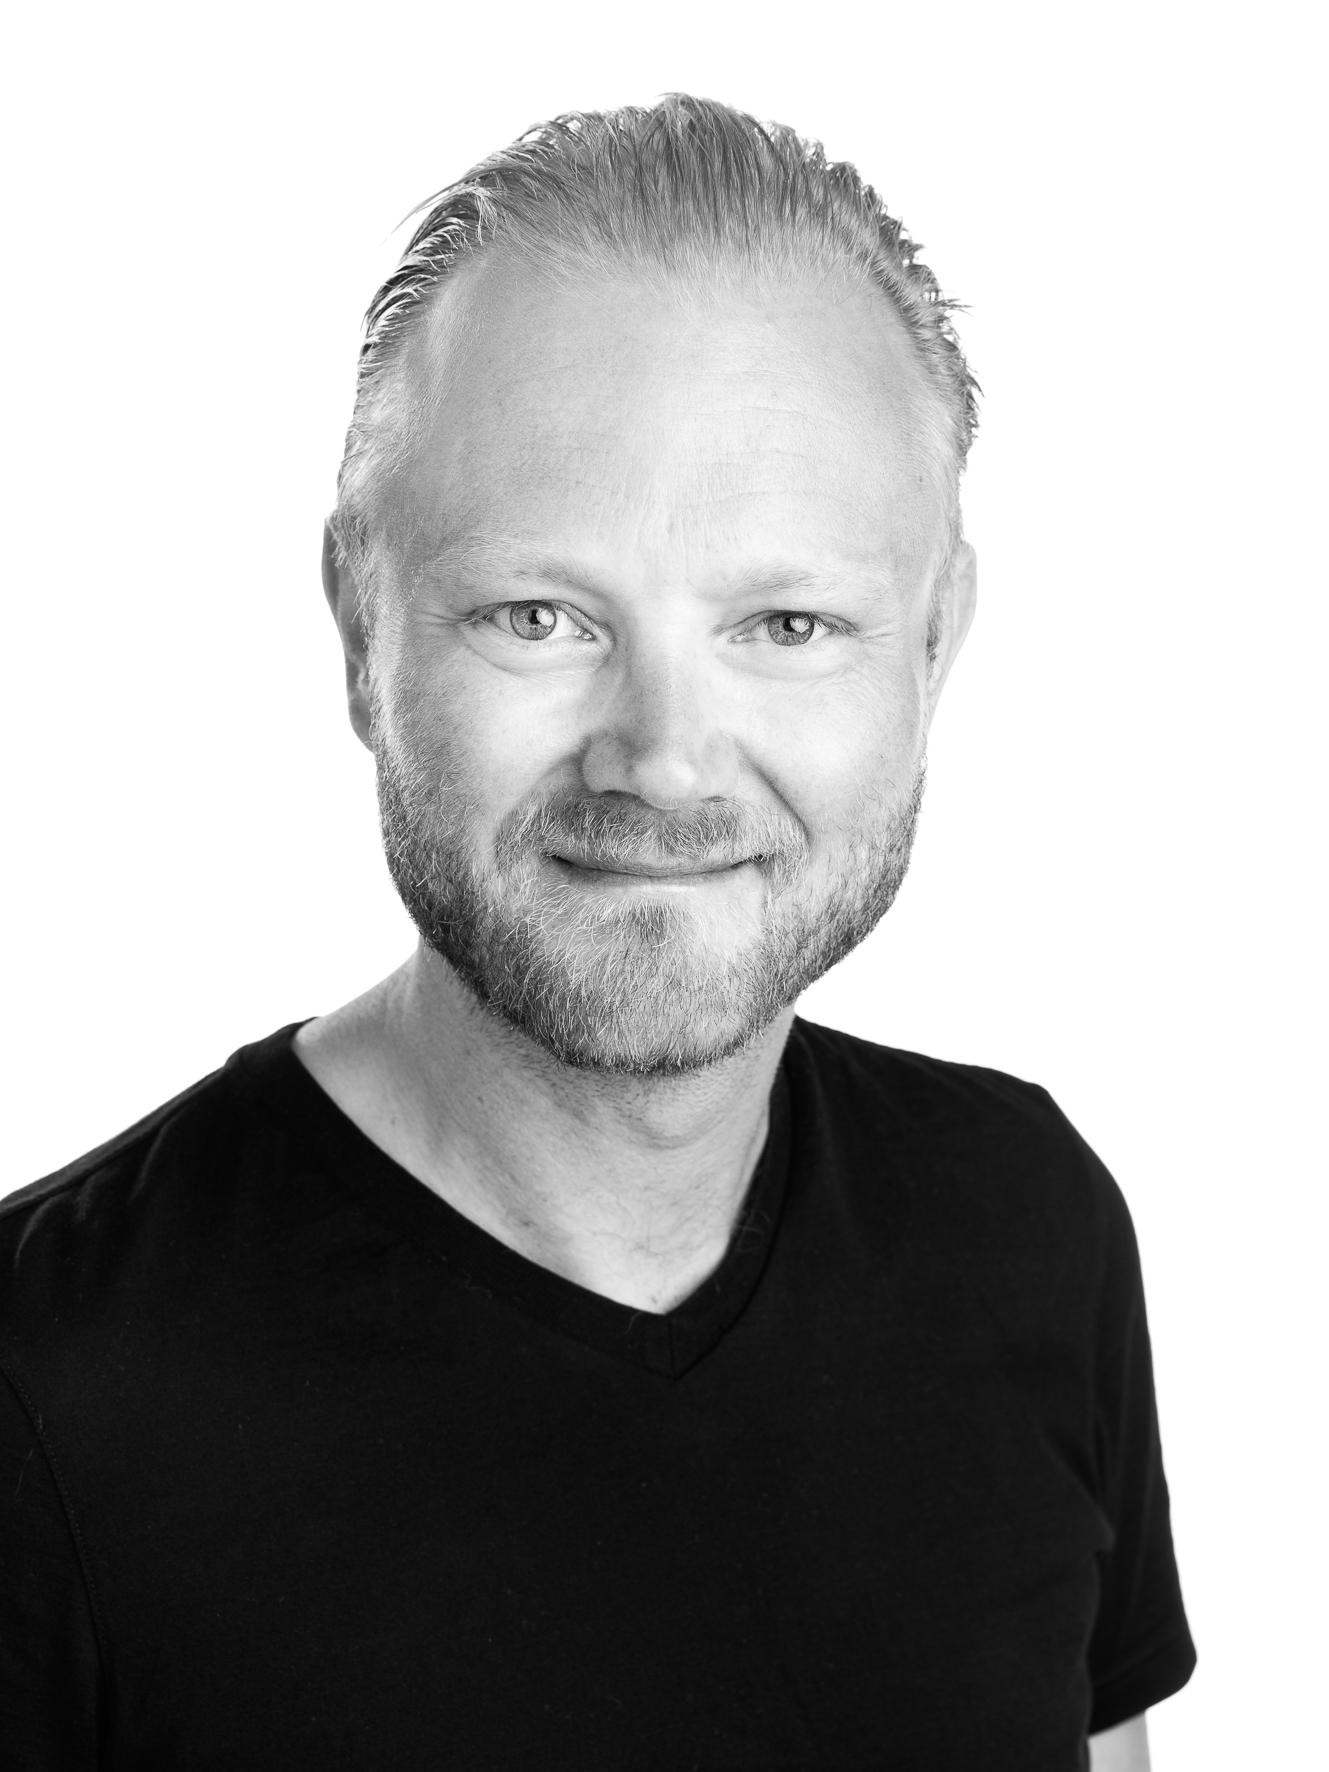 31834 Klinik 34 Fredrik Berne 2017-06-19-8-Redigera